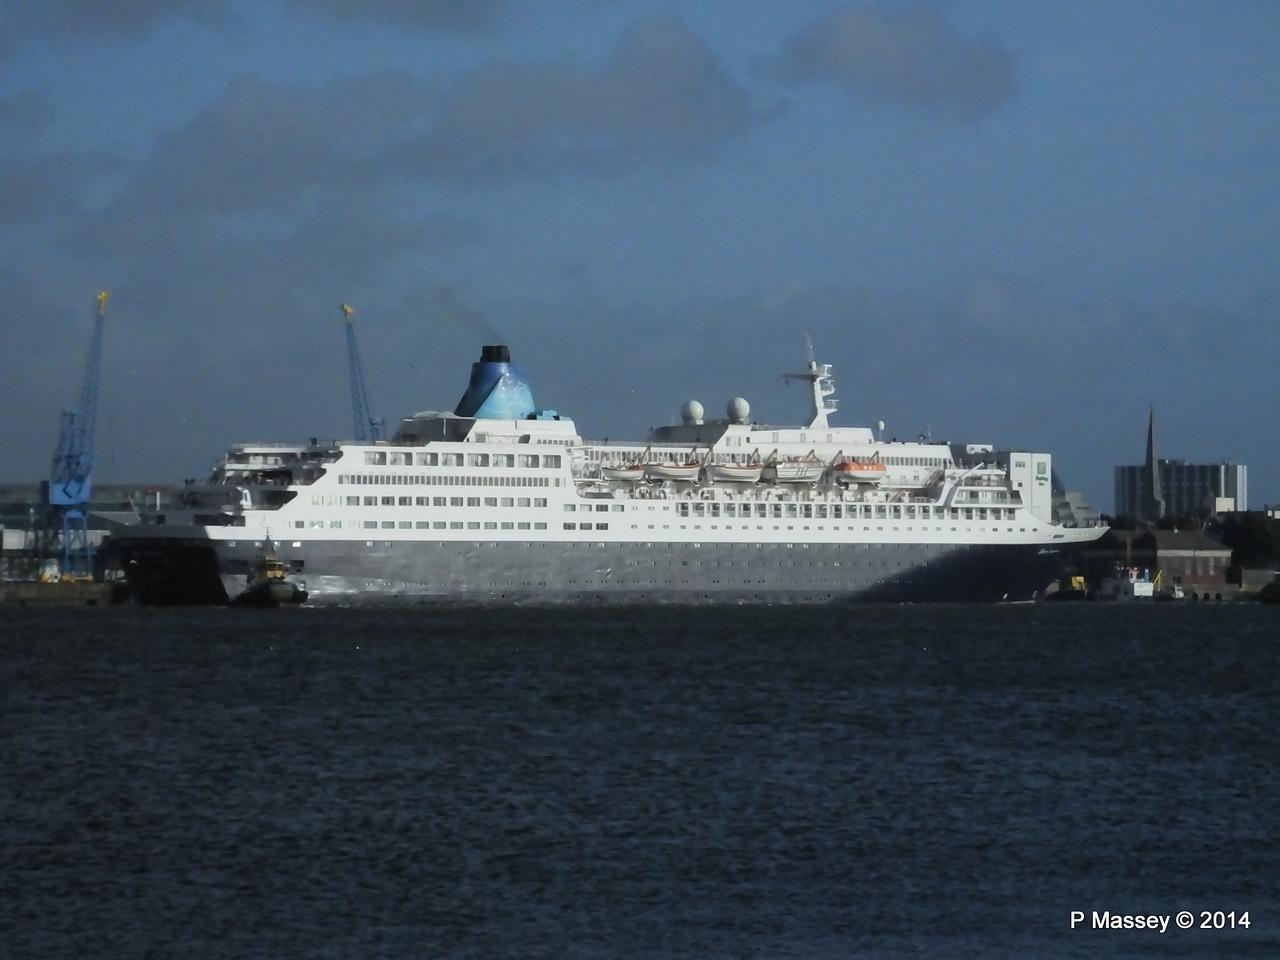 SAGA SAPPHIRE Departing Southampton PDM 07-01-2014 12-15-58